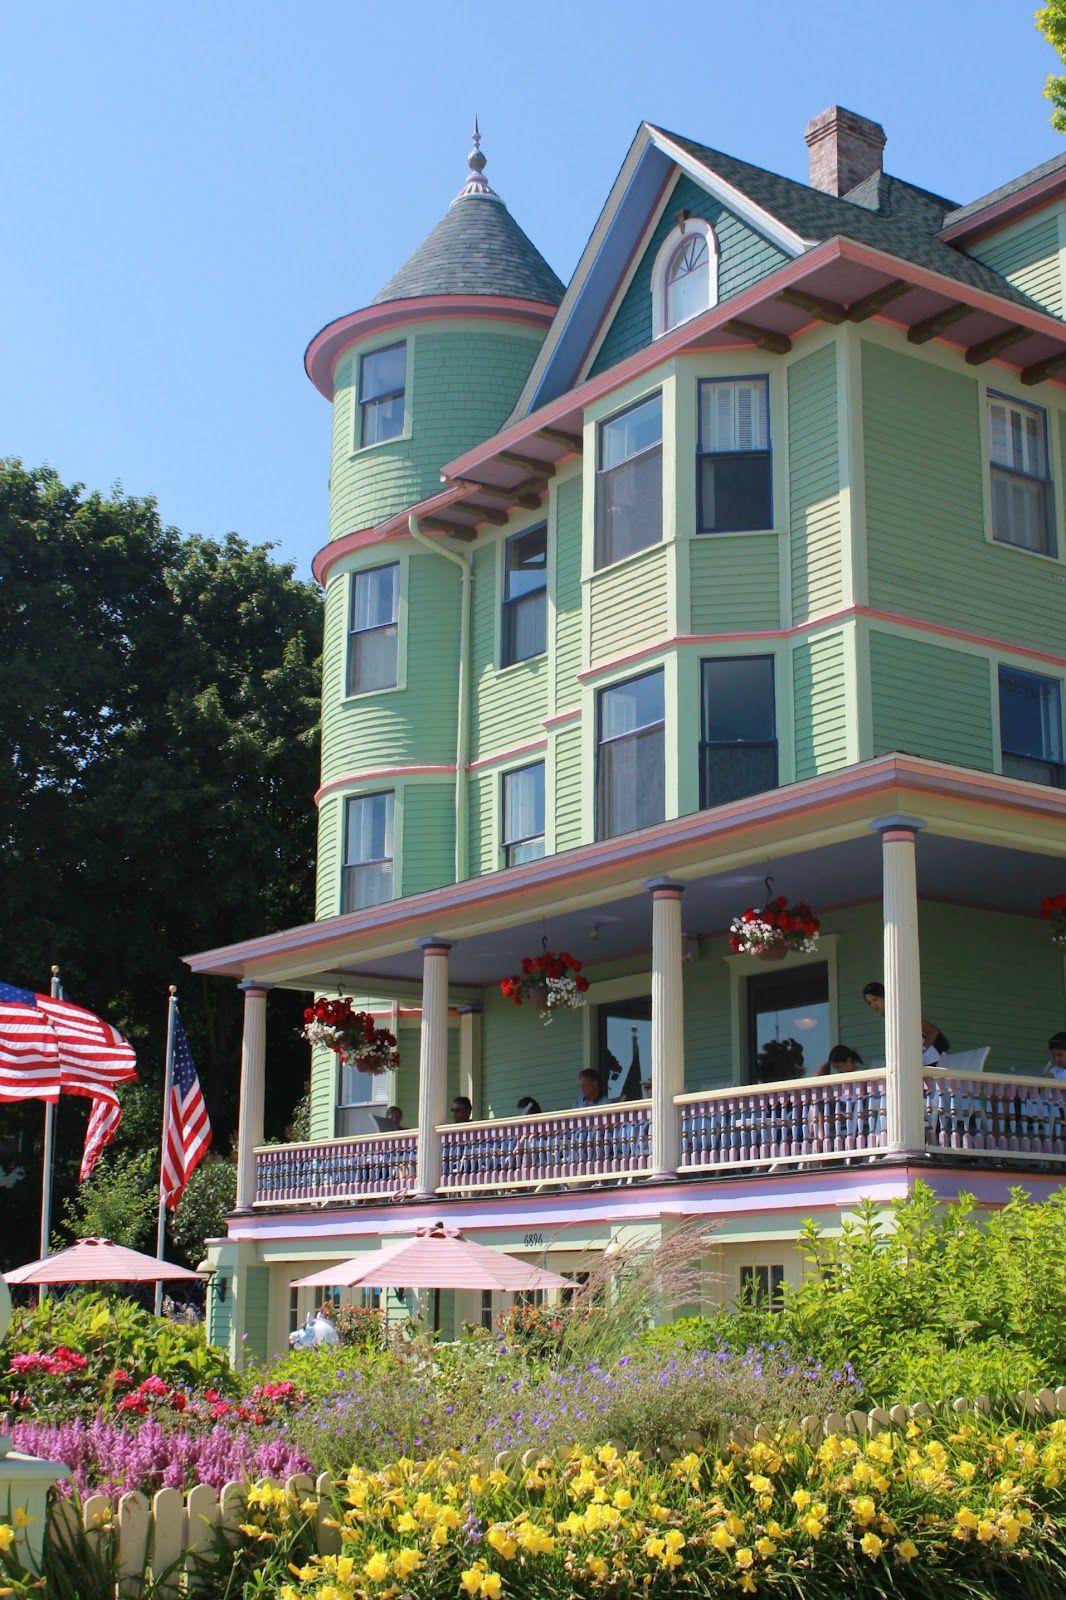 The Inn on Mackinac Bed & Breakfast on Mackinac Island, MI